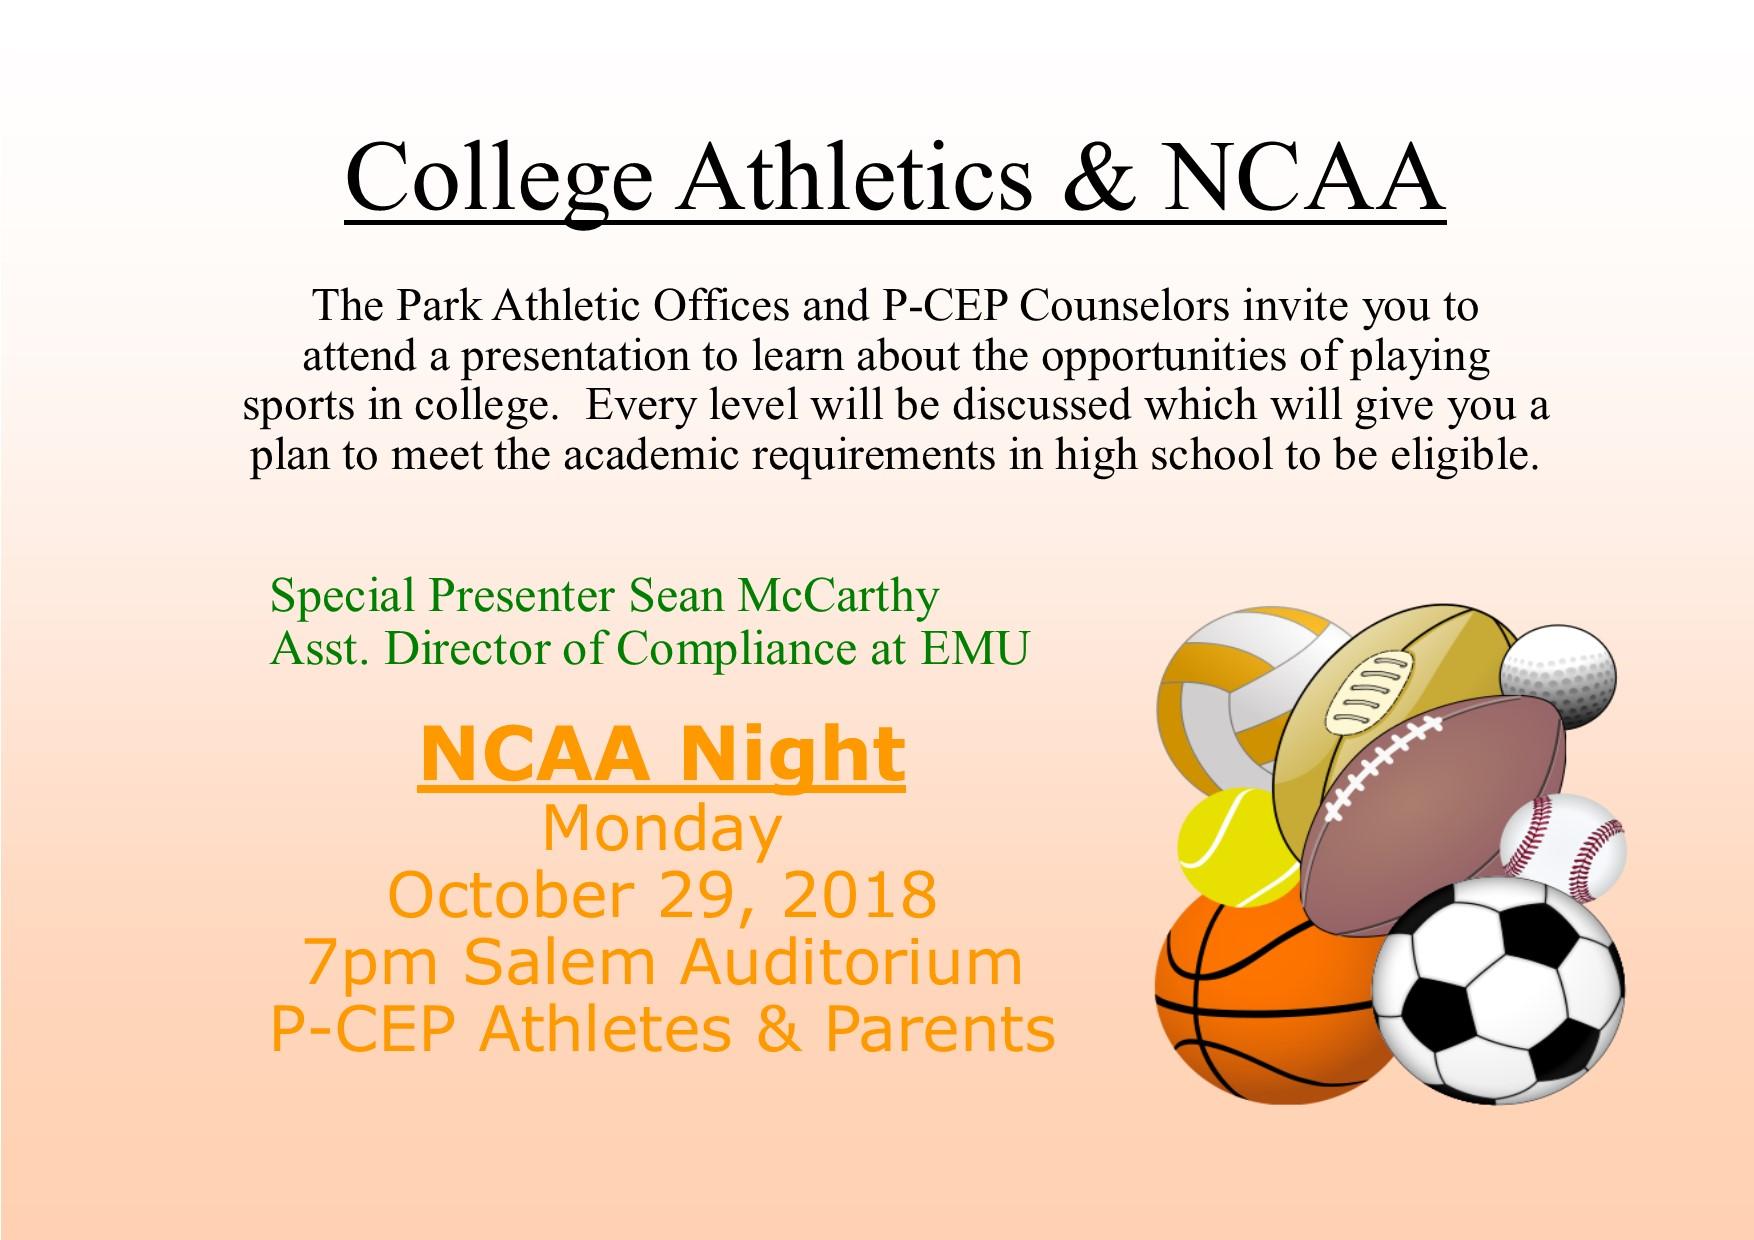 NCAA Night and College Athletics